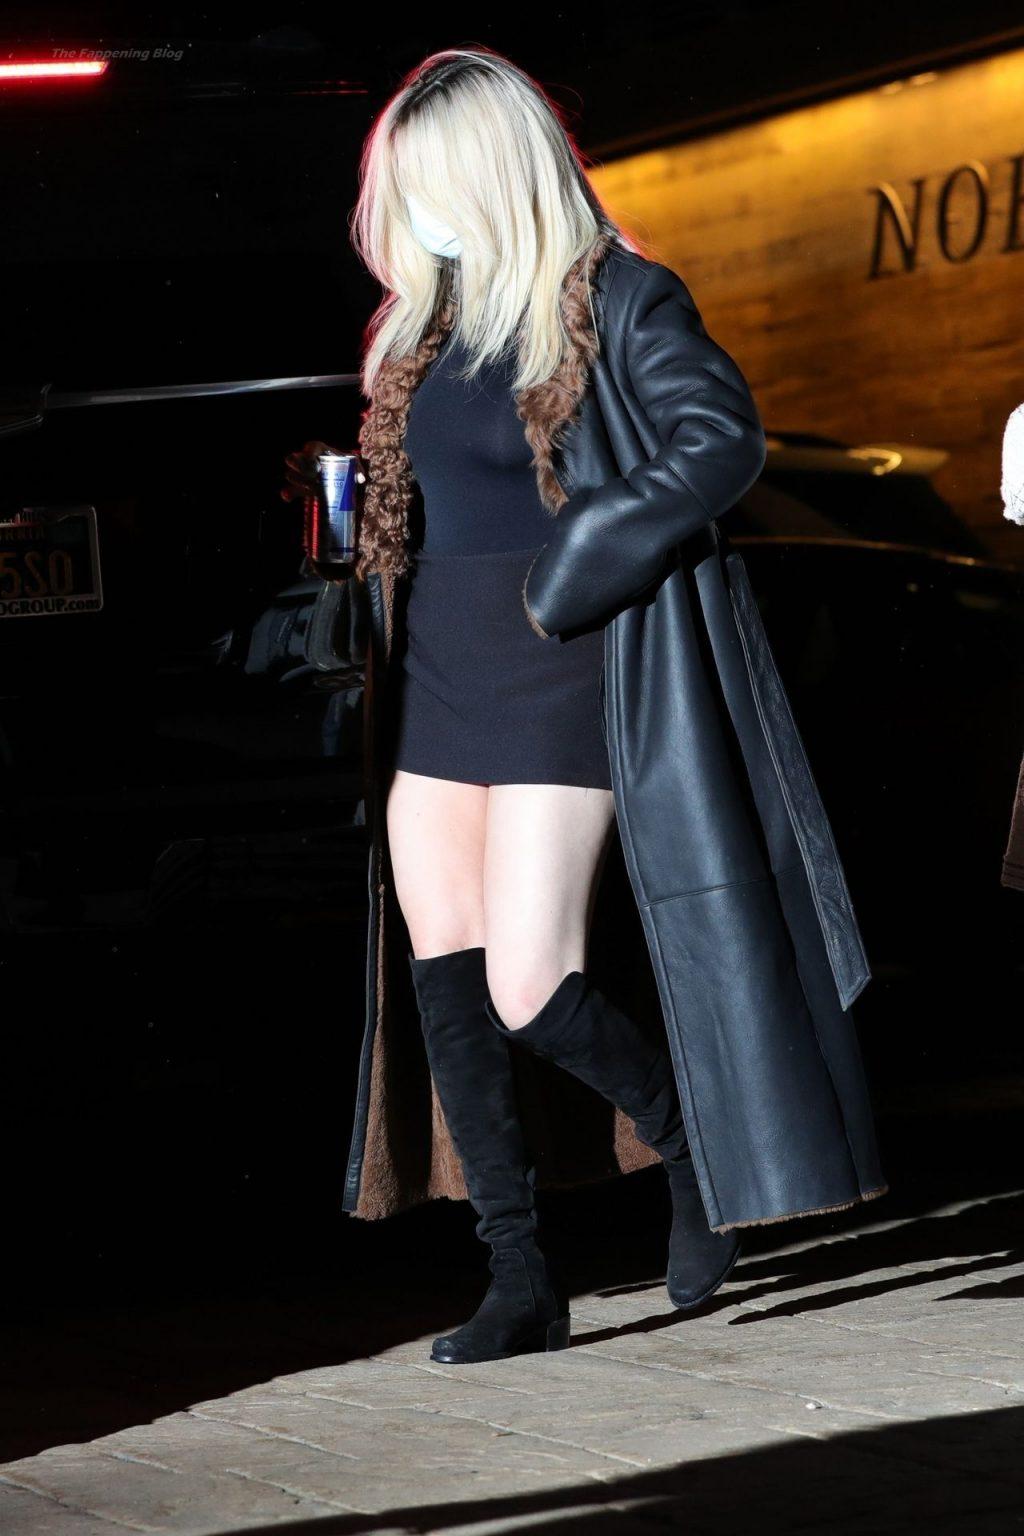 Selena Gomez Shows Off Legs In a Sexy Mini-Dress at Nobu (37 Photos)